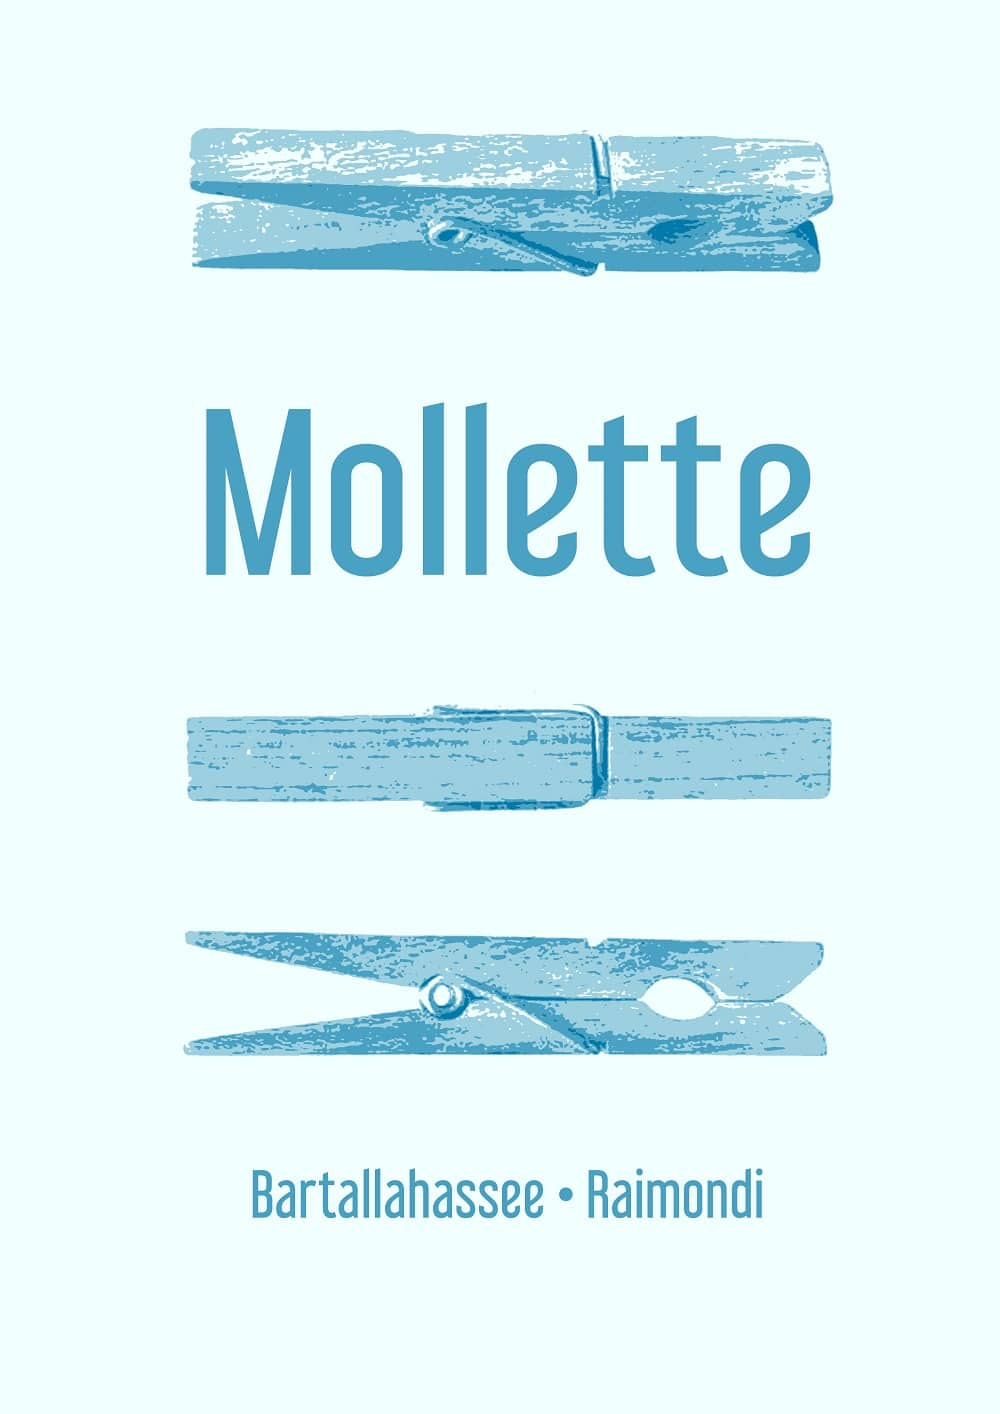 Mollette-di-Bartallahssee-e-Chiara-Raimondi_One shot